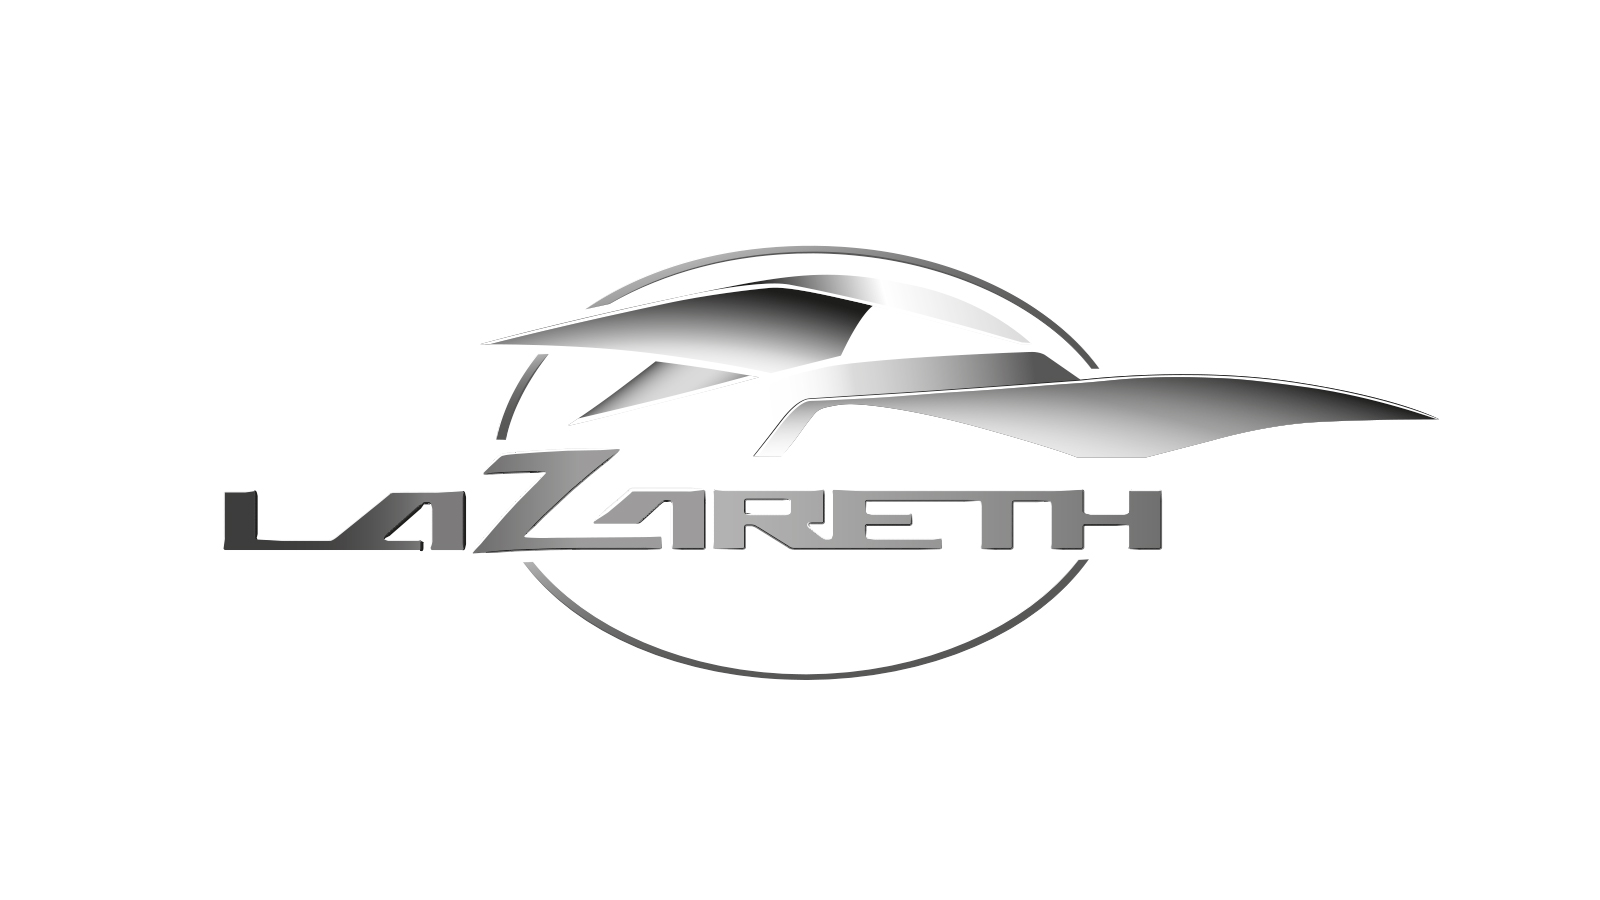 Logo_lazareth_1.jpg